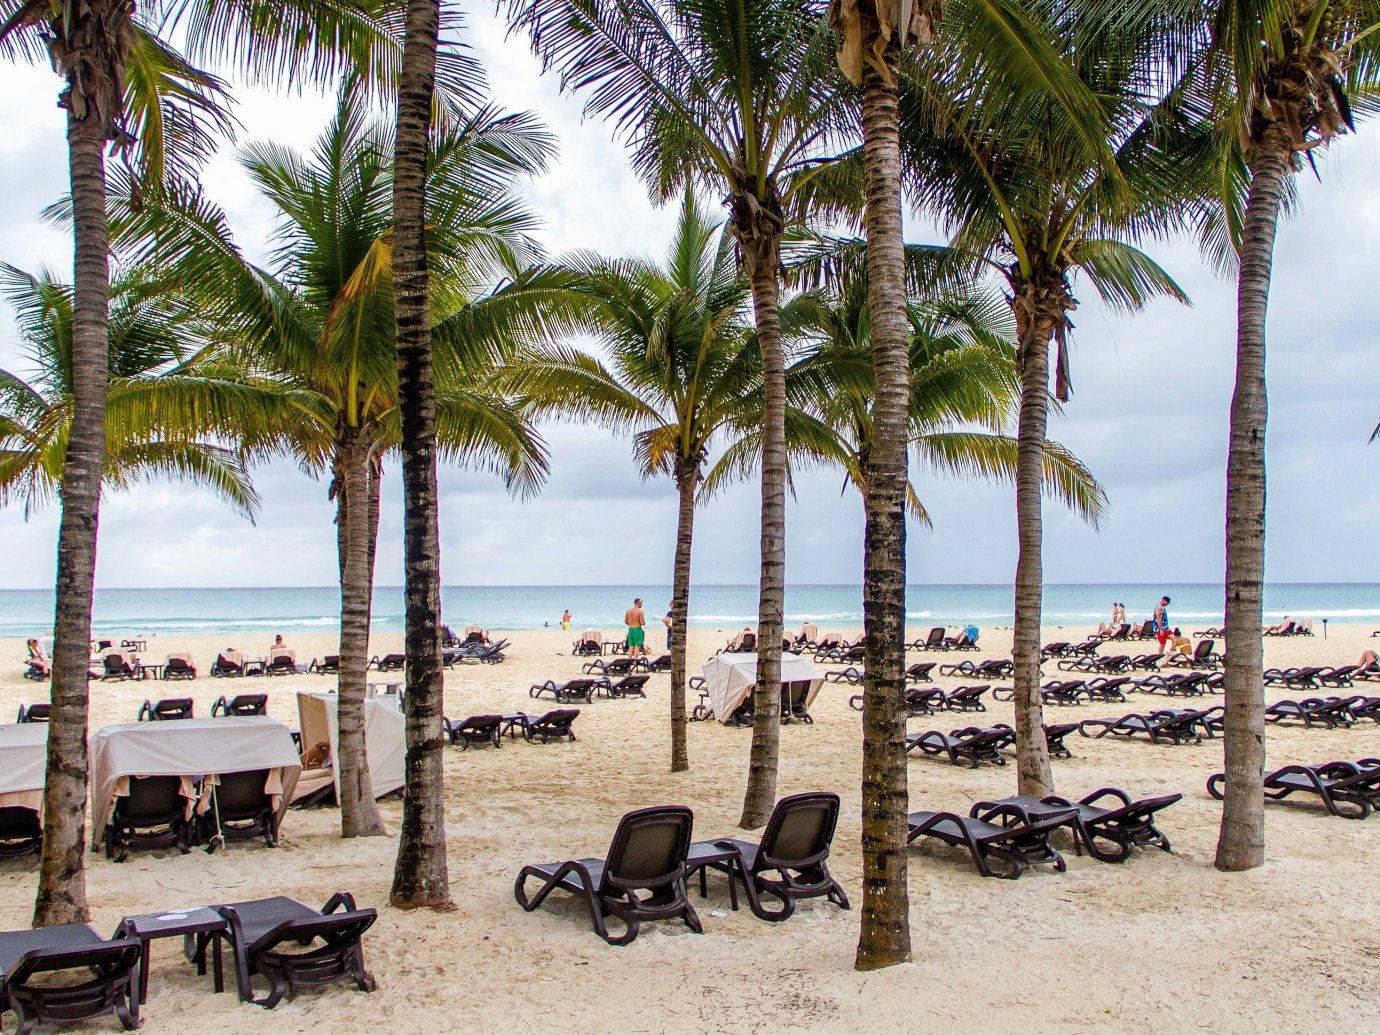 All-inclusive All-Inclusive Resorts Mexico Riviera Maya, Mexico Beach arecales palm tree tree Resort tropics vacation shore tourism plant caribbean Sea sky sand coconut